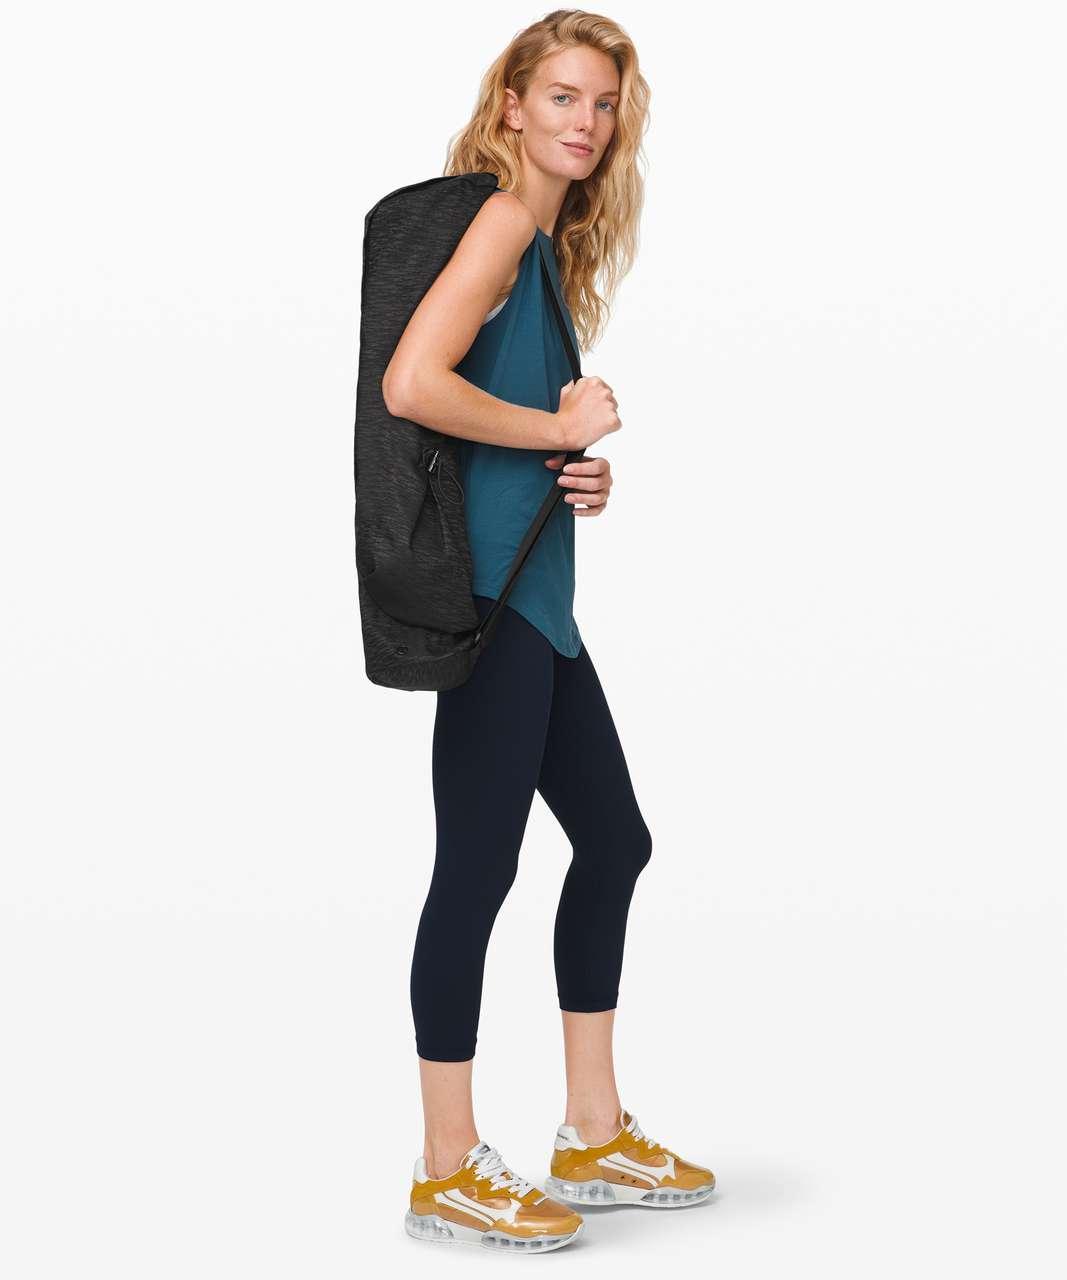 Lululemon The Yoga Mat Bag *16L - Aqueous Ikat Jacquard Black Highlander